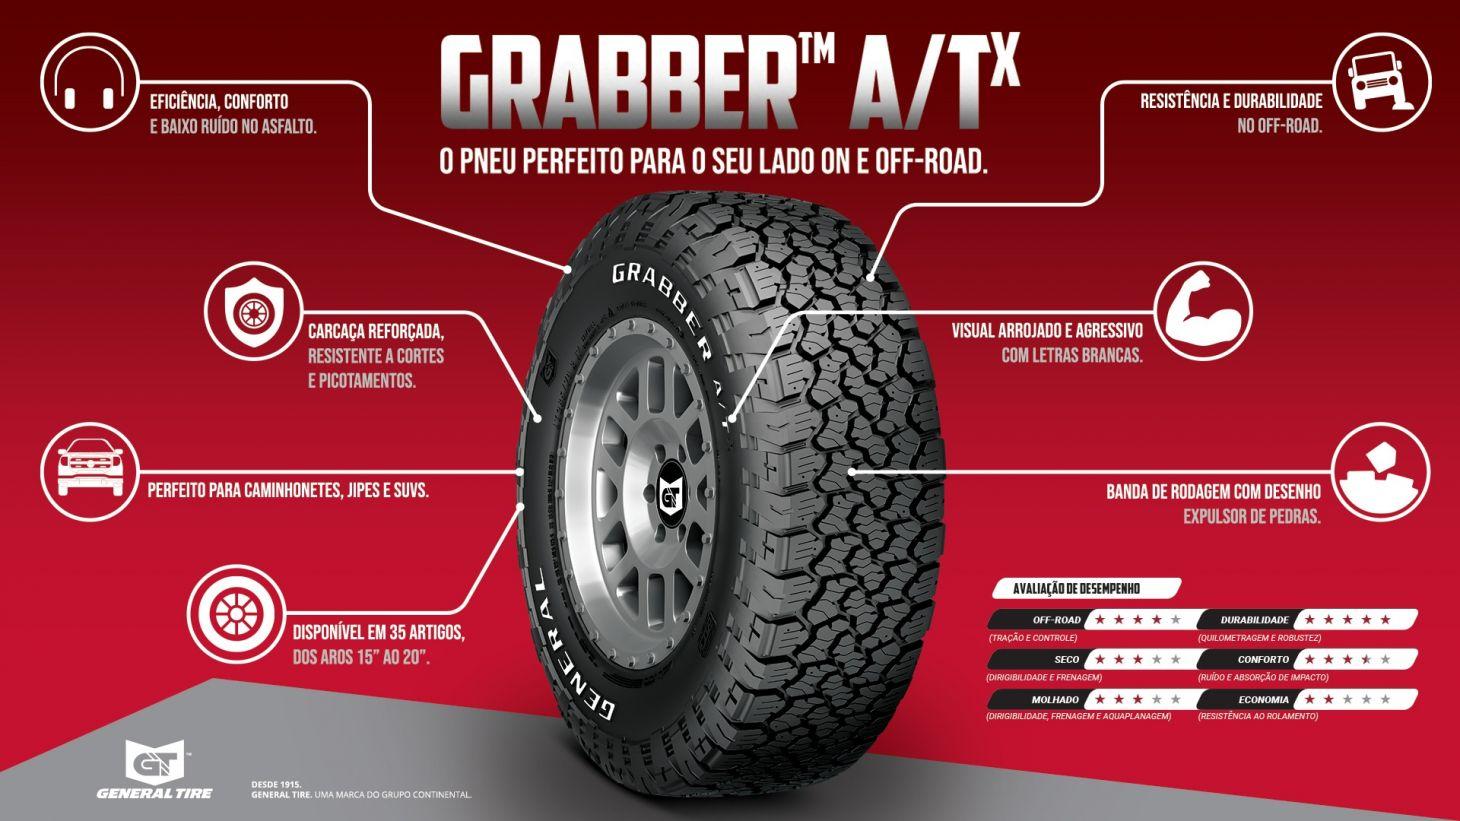 Infográfico sobre o novo pneu General Tire Grupo Continental AT2 Grabber AT/X